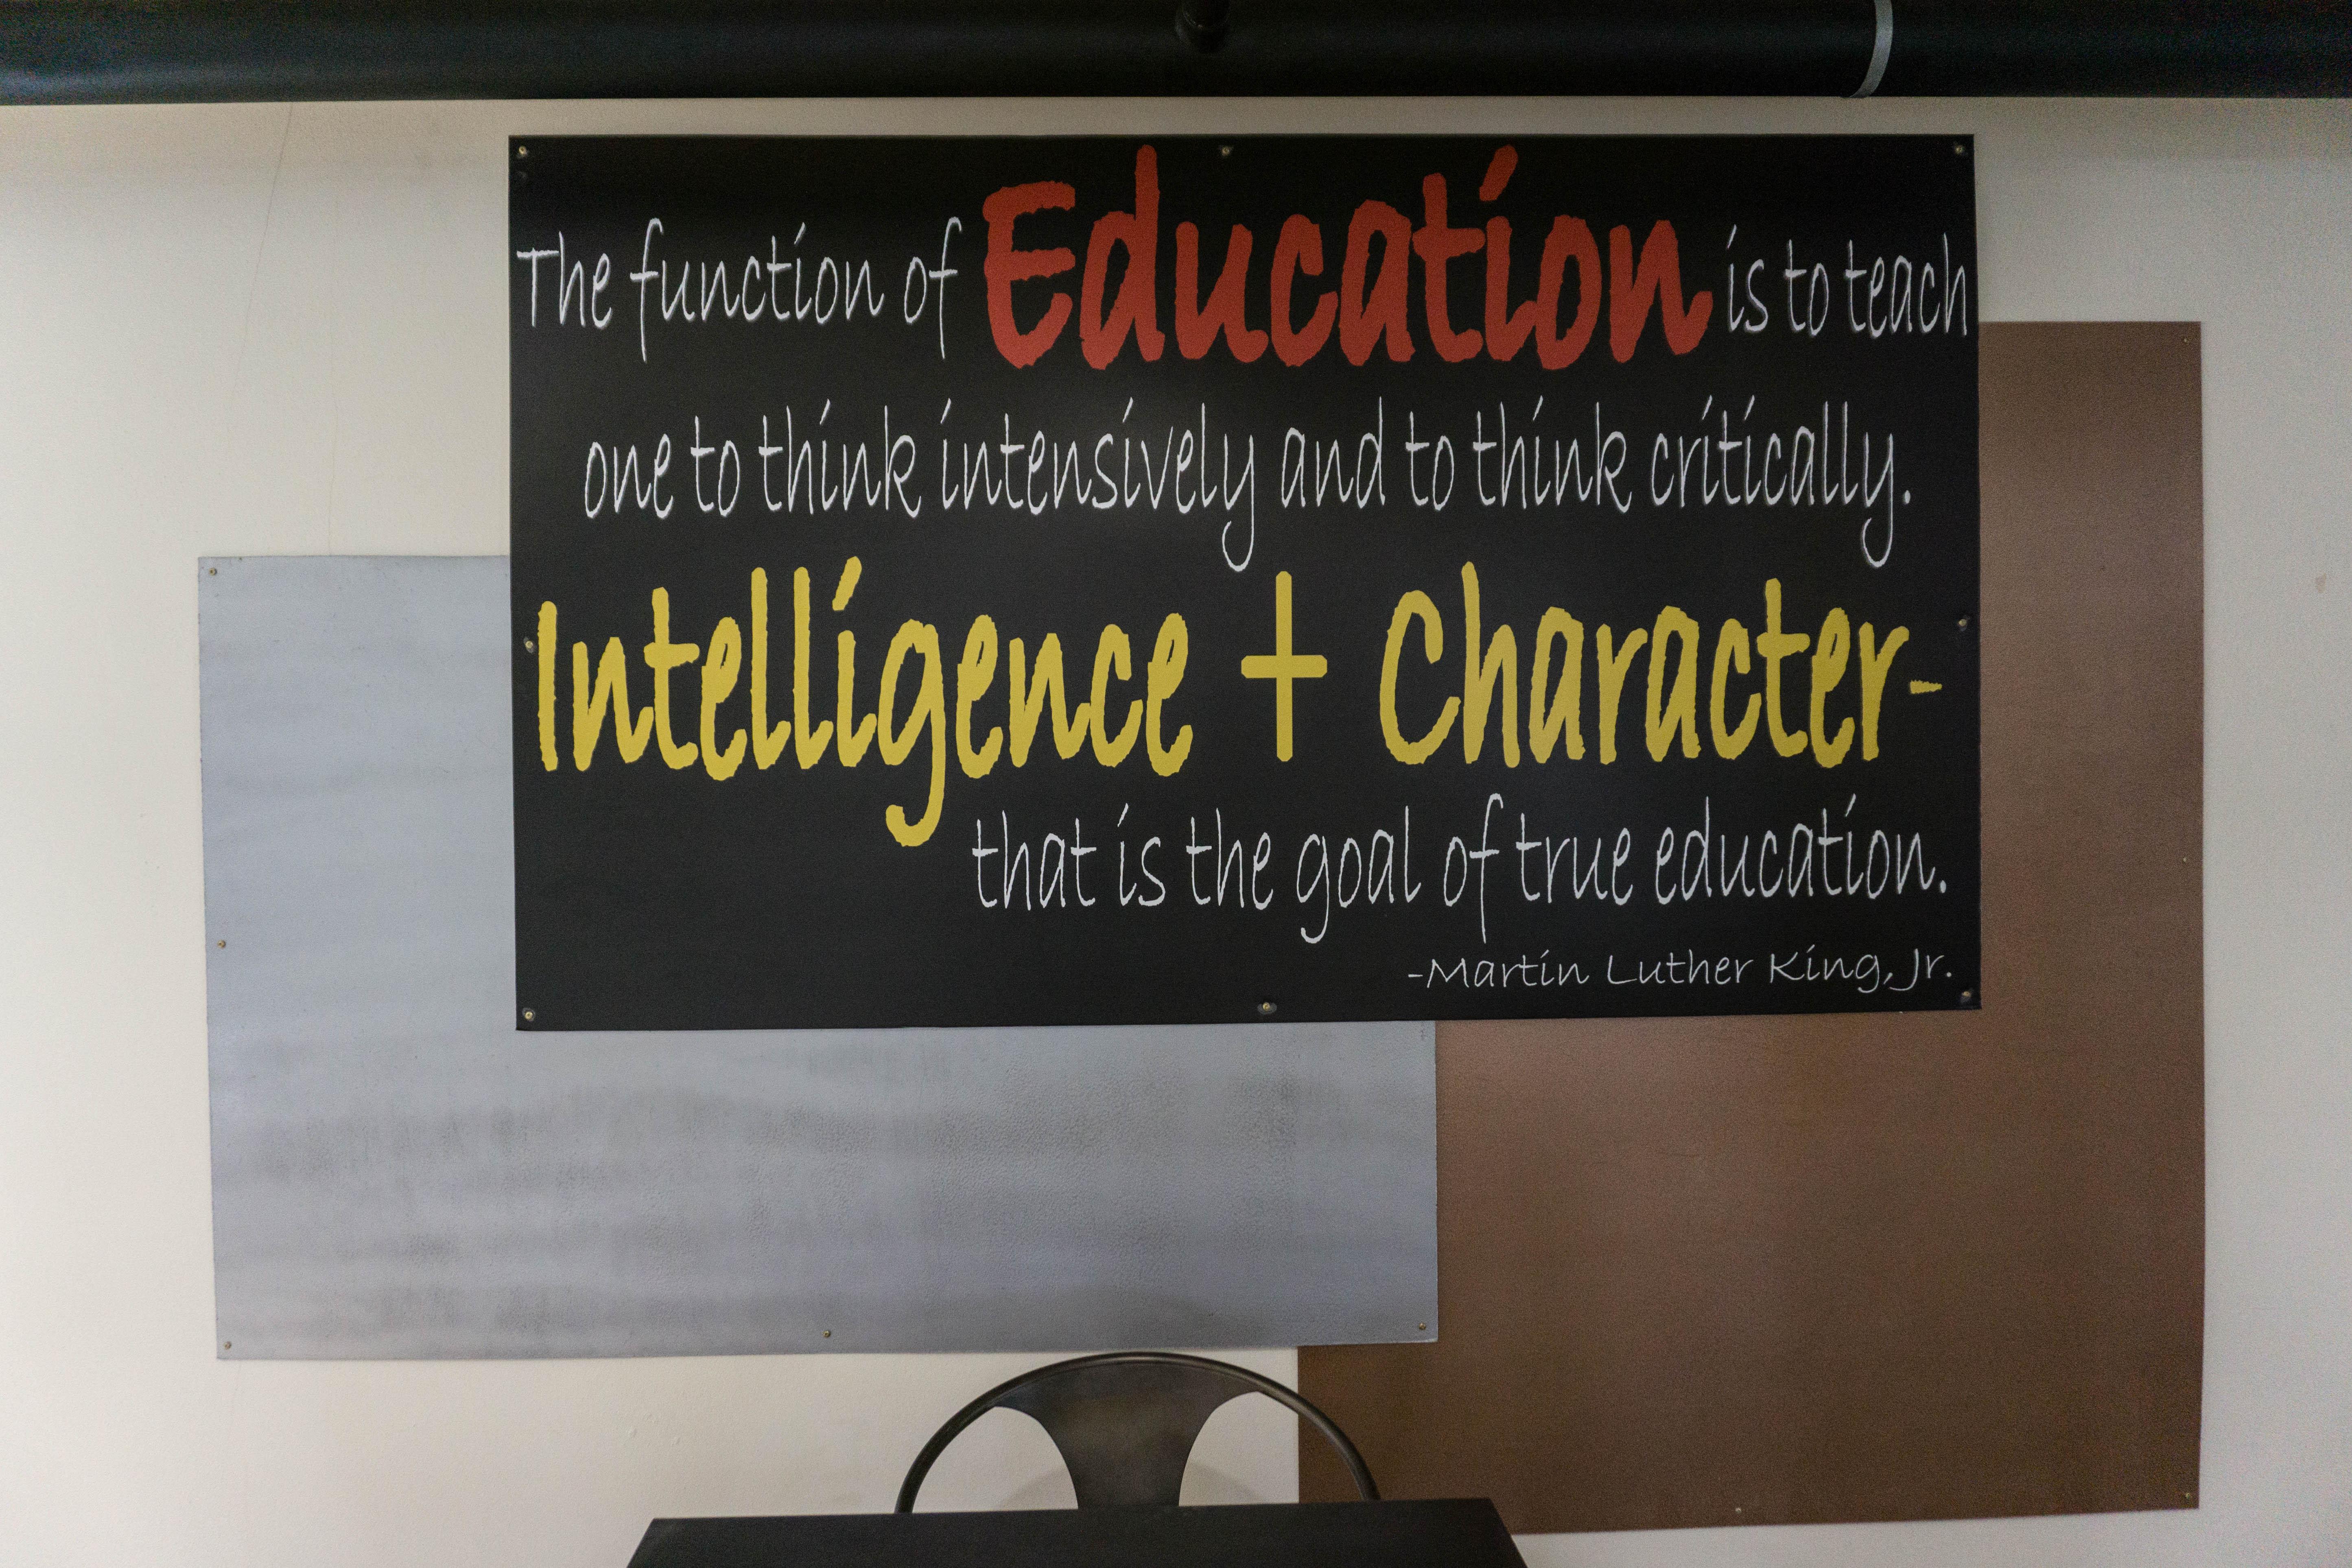 Education importance